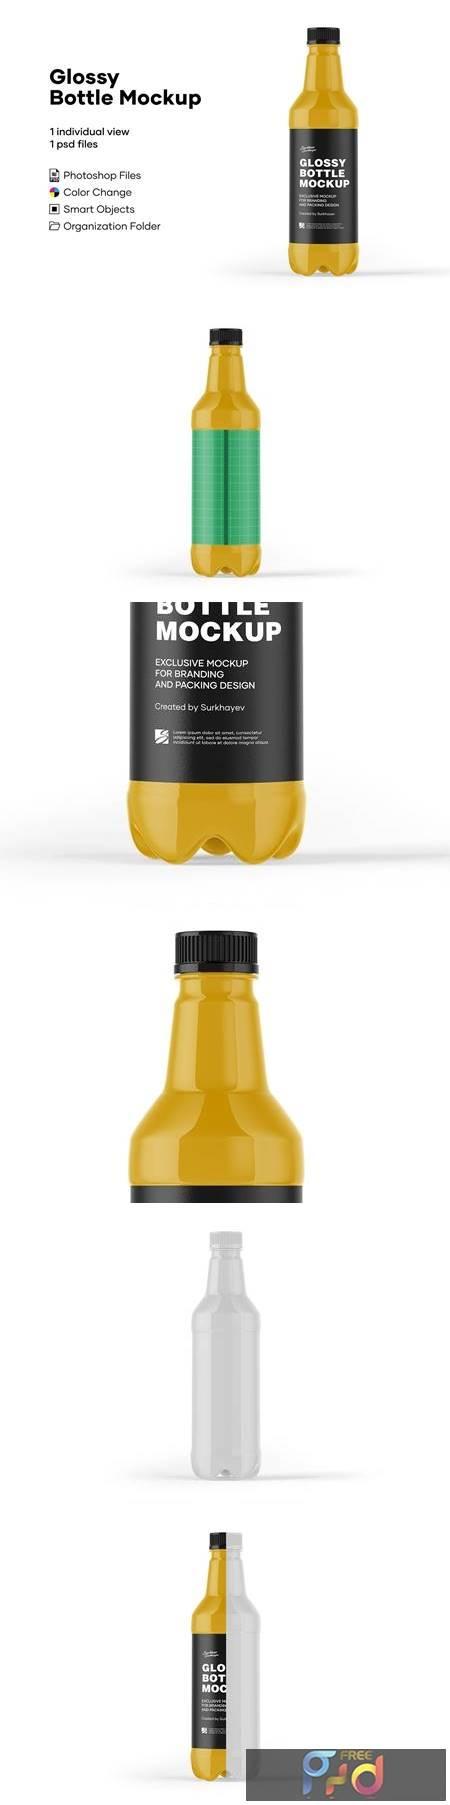 Glossy Bottle Mockup 5242097 1